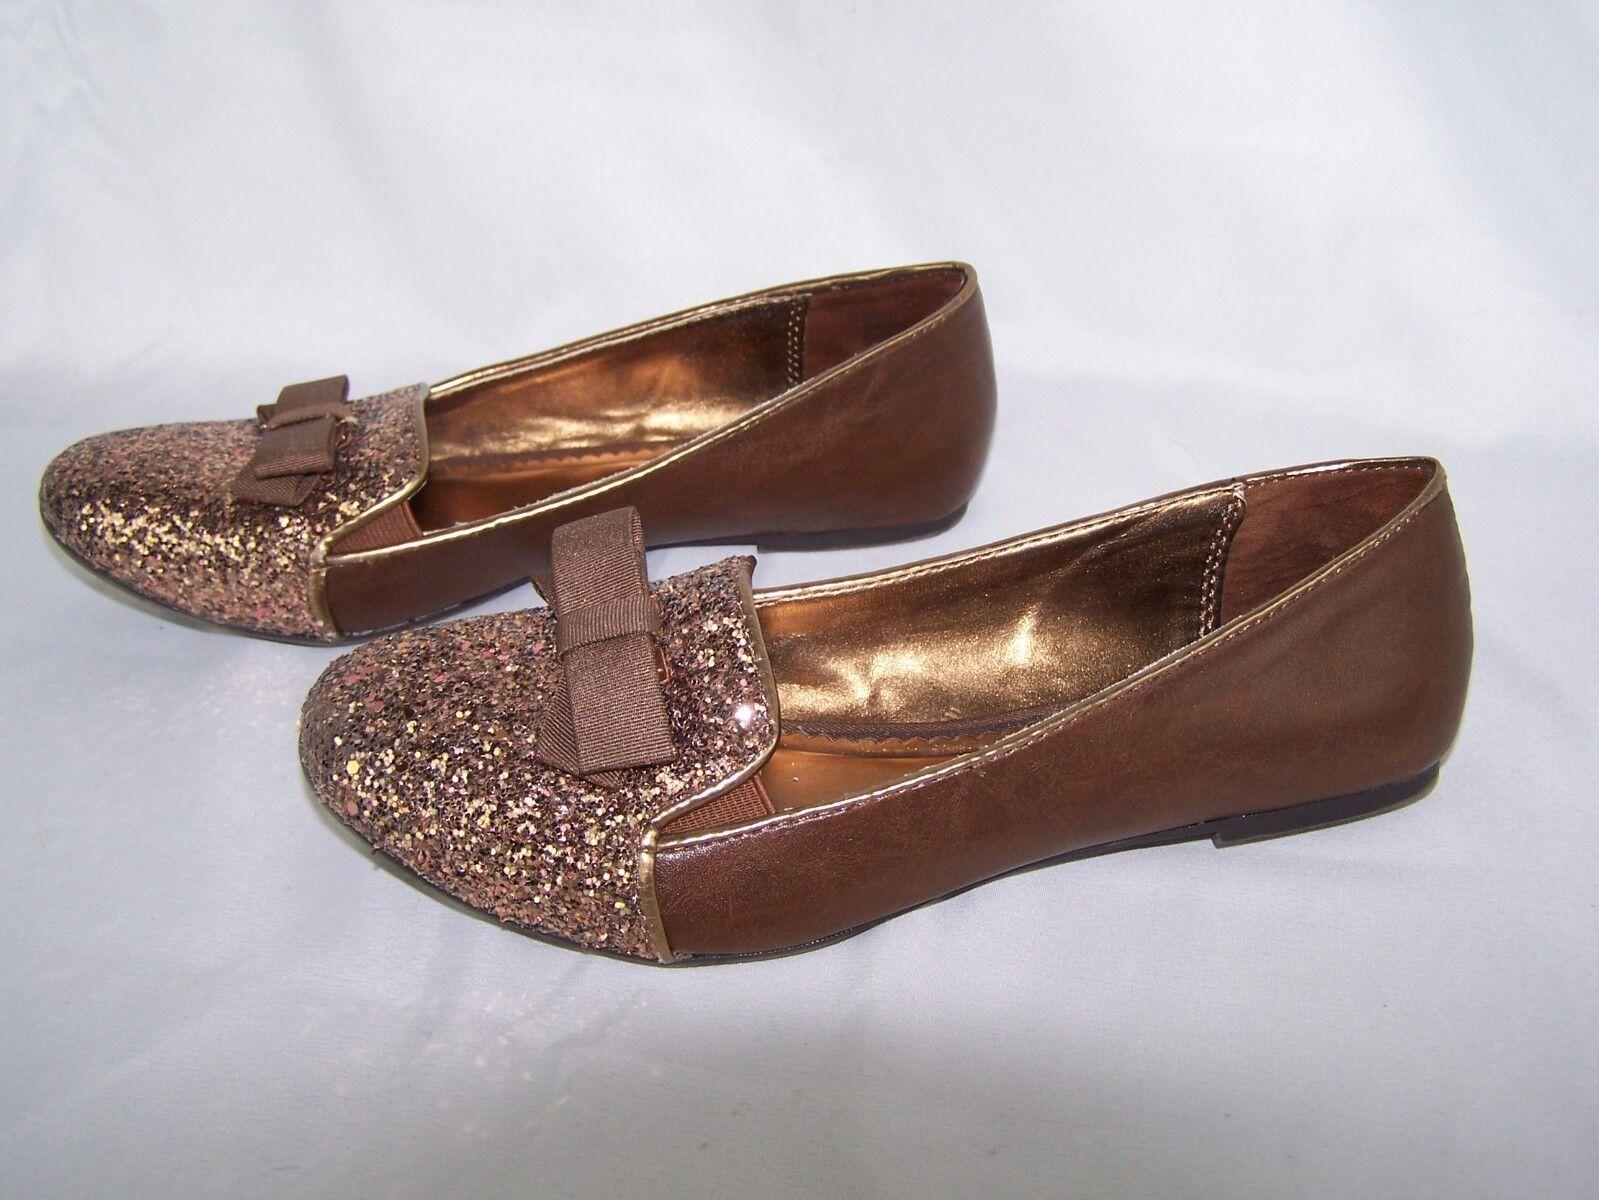 Nine West Women's 4.5 Brown Glitter Slip On Shoes Flats